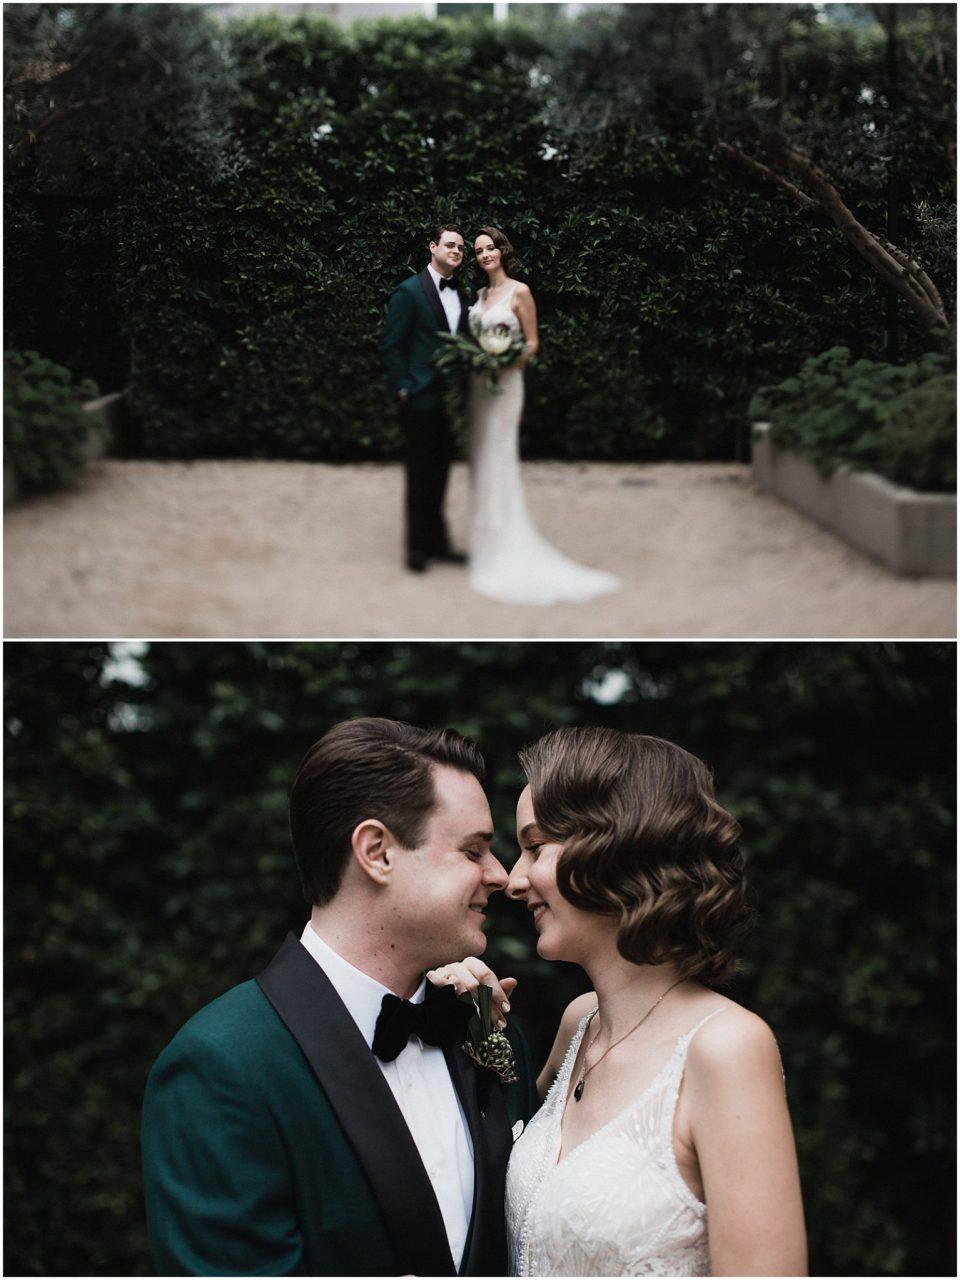 jessthony-wedding-sullivan-and-sullivan (149 of 496)_seattle wedding.jpg